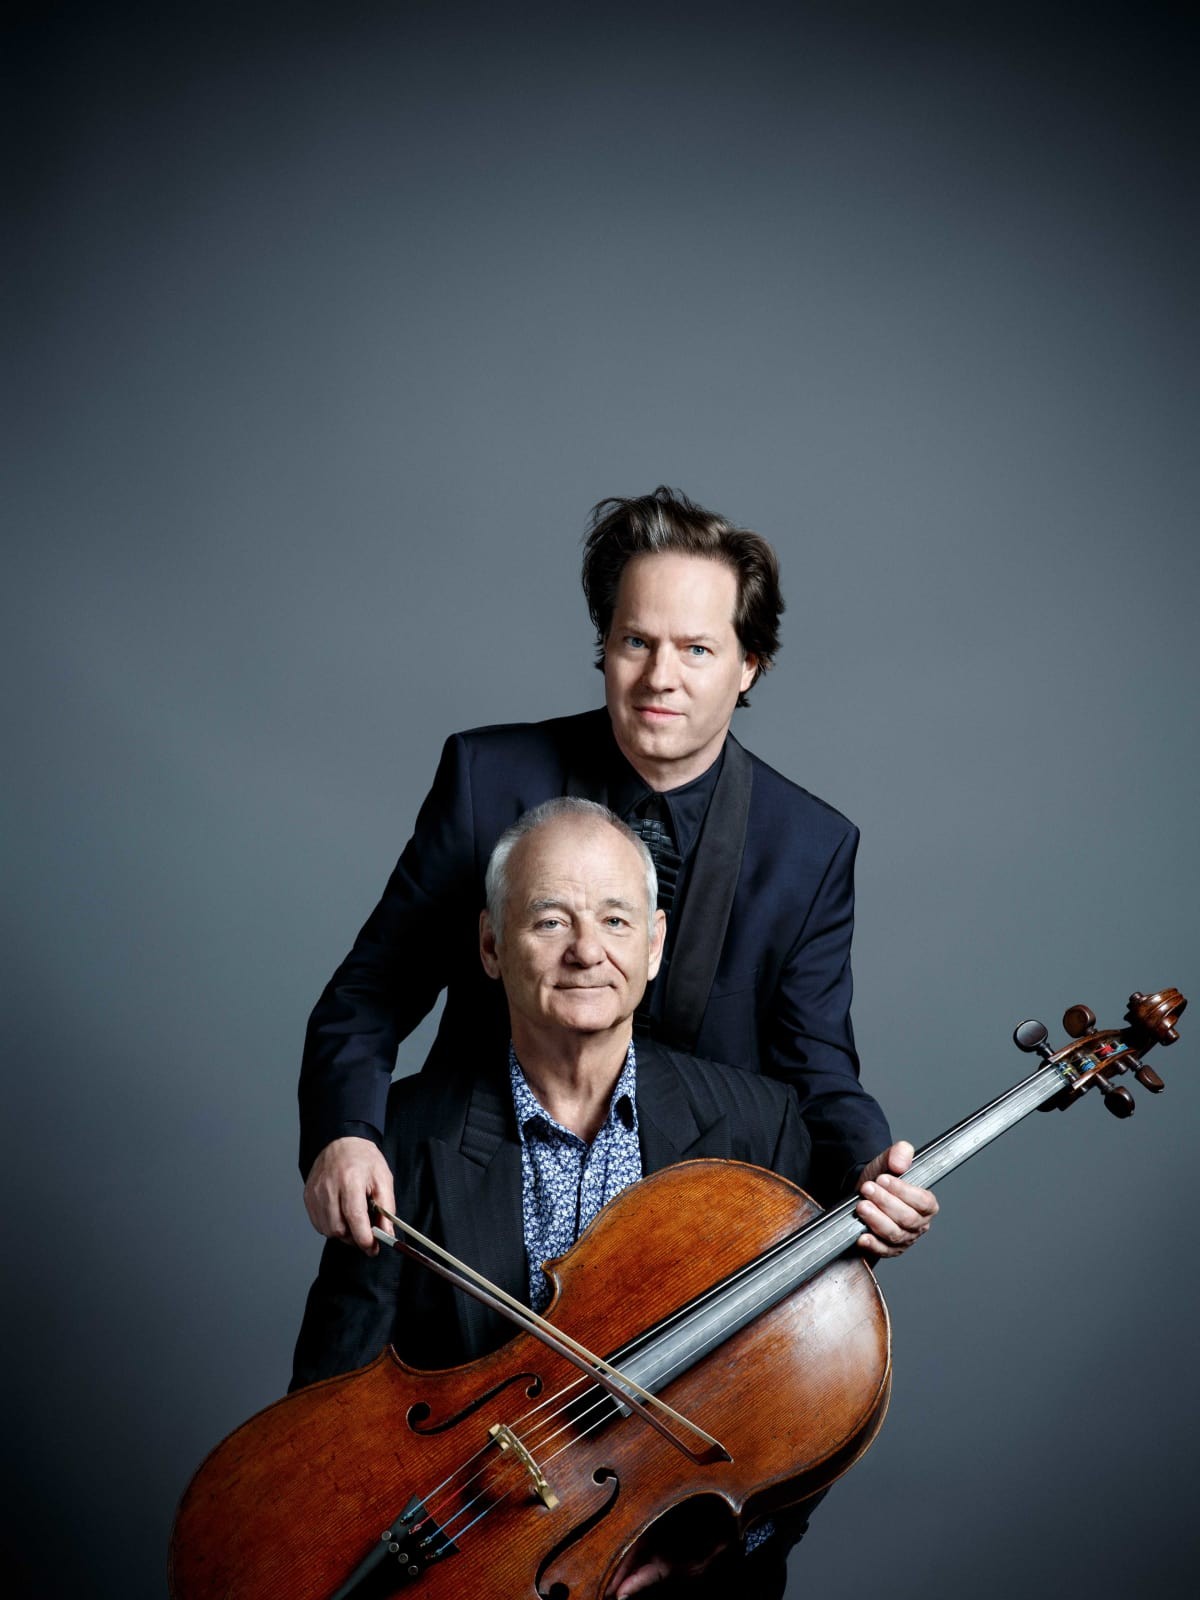 Bill Murray and Jan Vogler